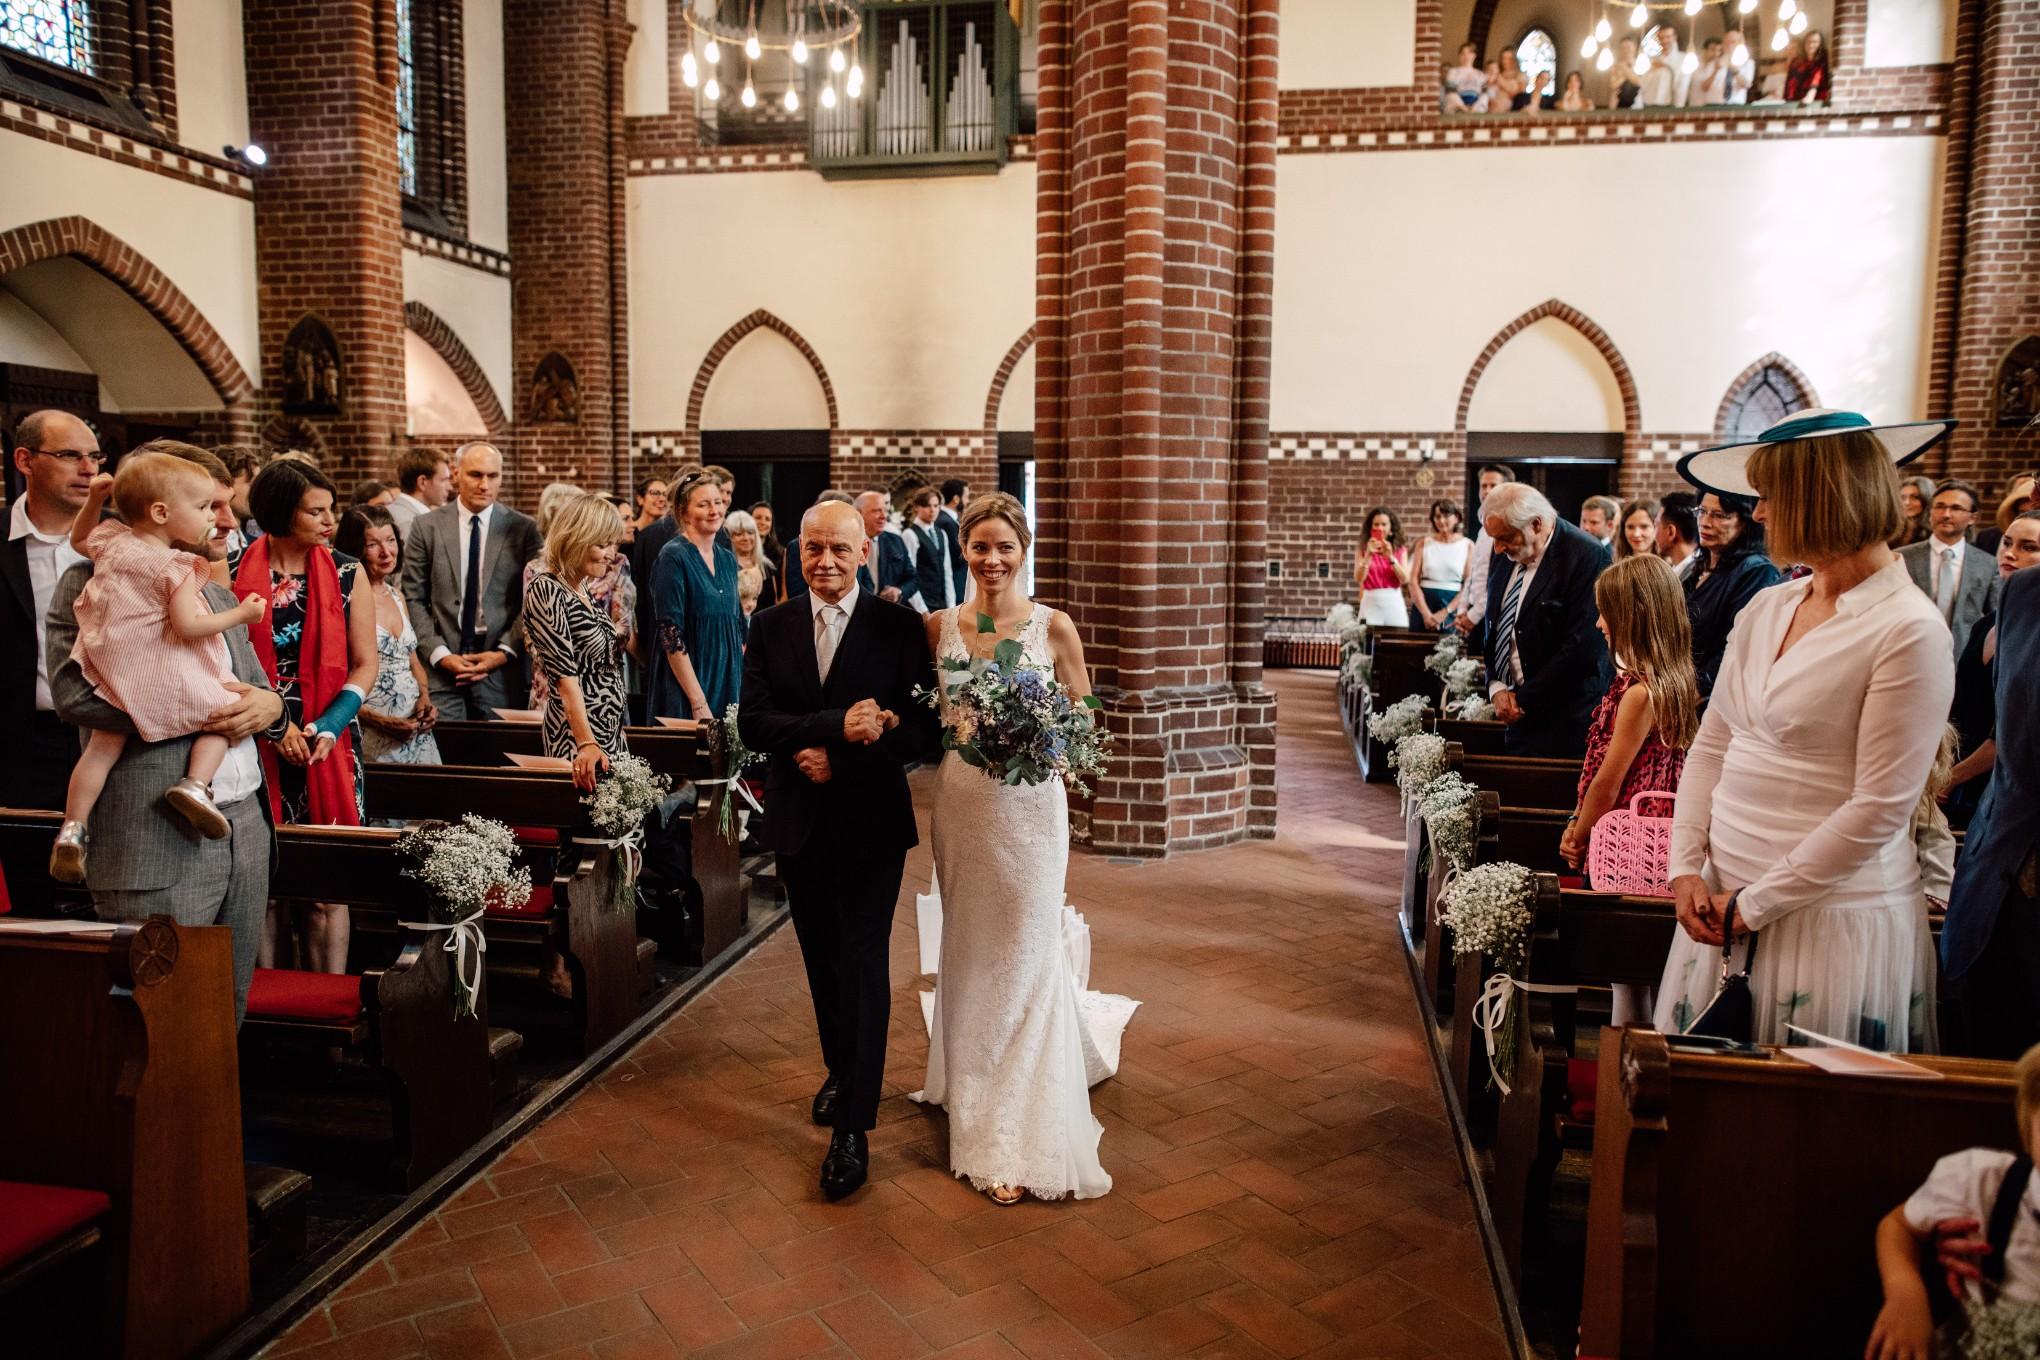 Berlin-Wannsee-Pia-Anna-Christian-Wedding-Photography-ST-8.jpg